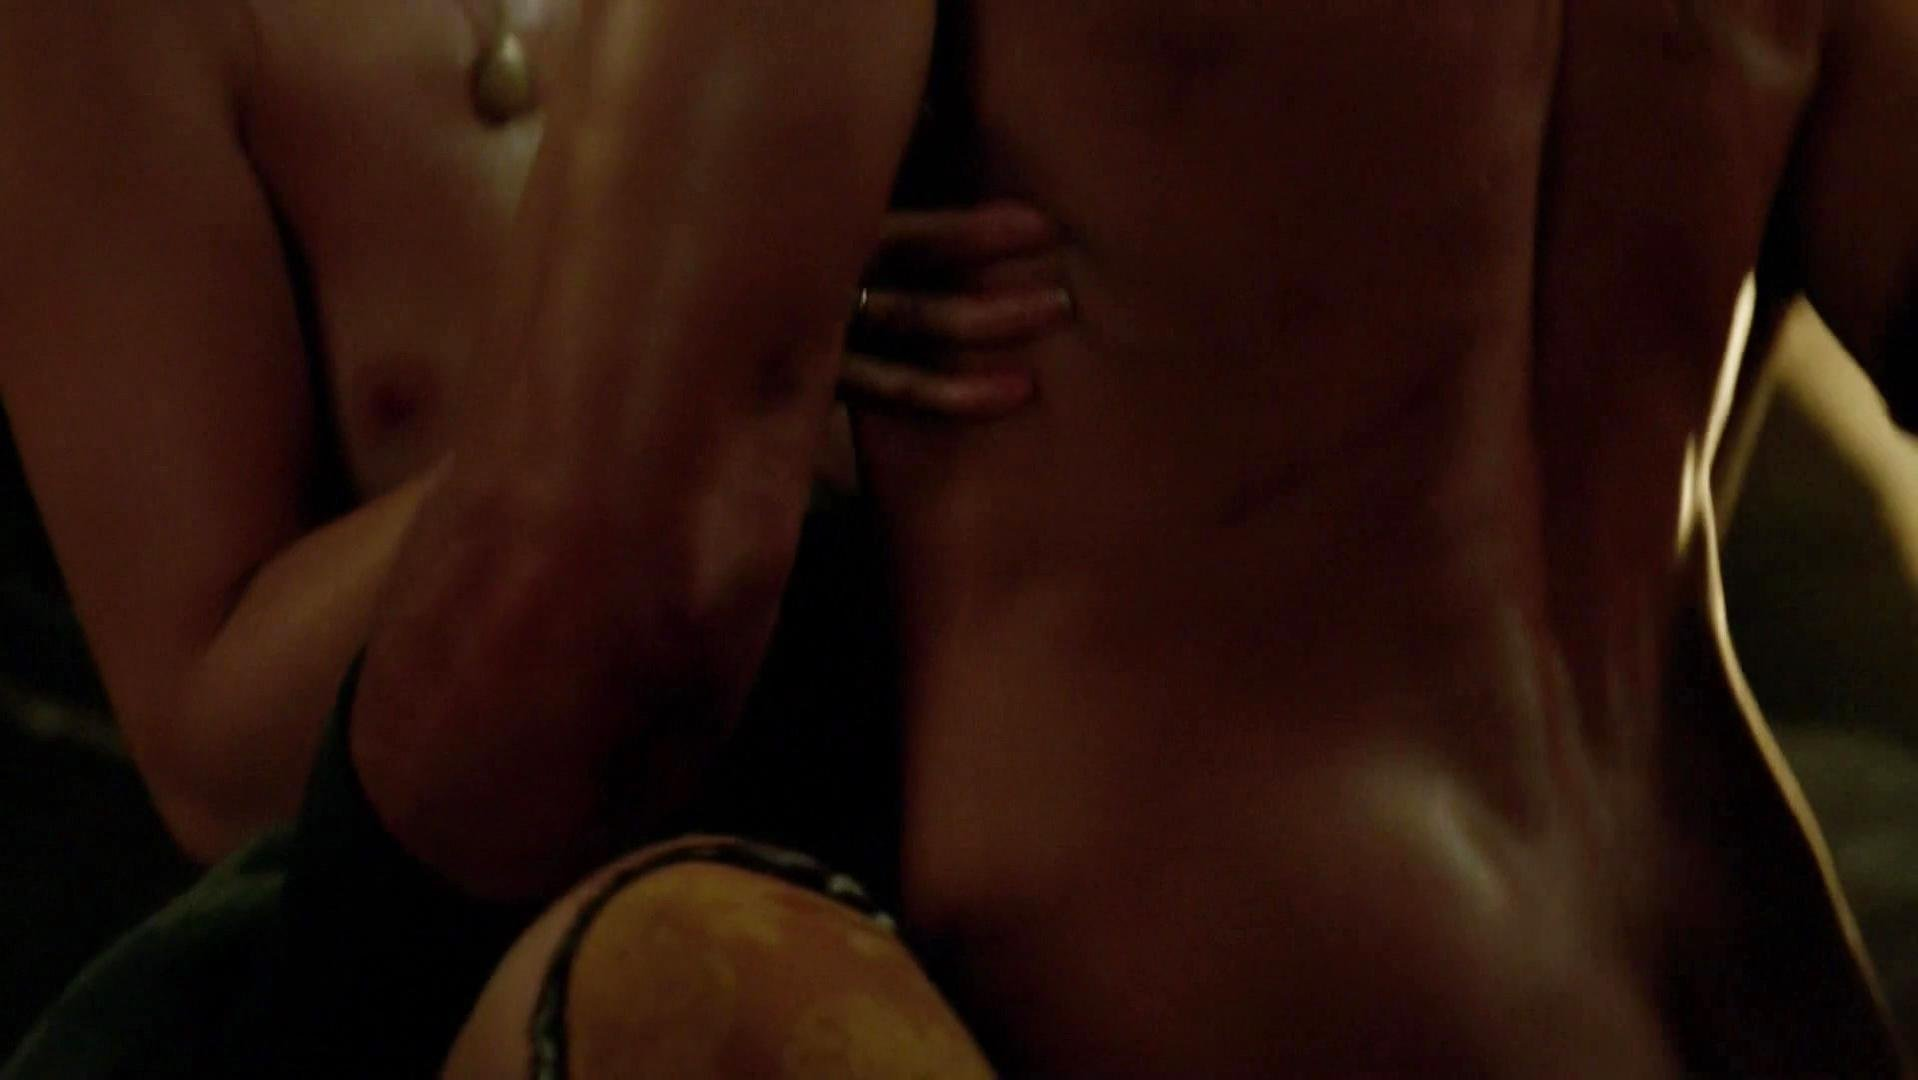 Hannah New nude - Black Sails s02e03 (2015)